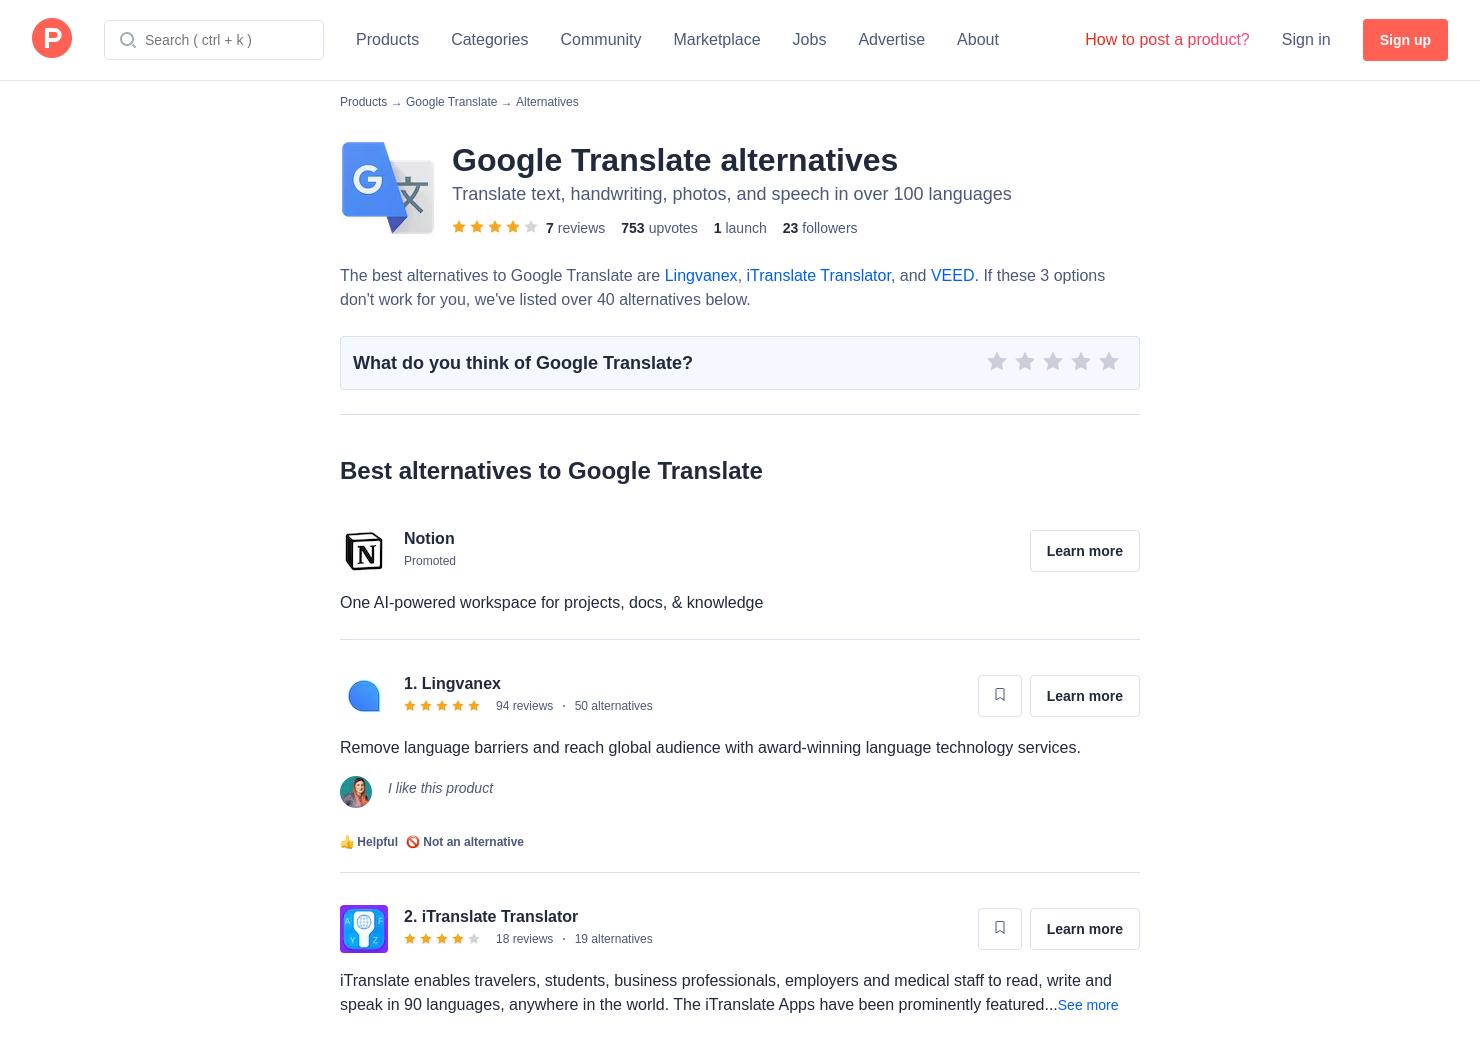 46 Alternatives to Google Translate | Product Hunt